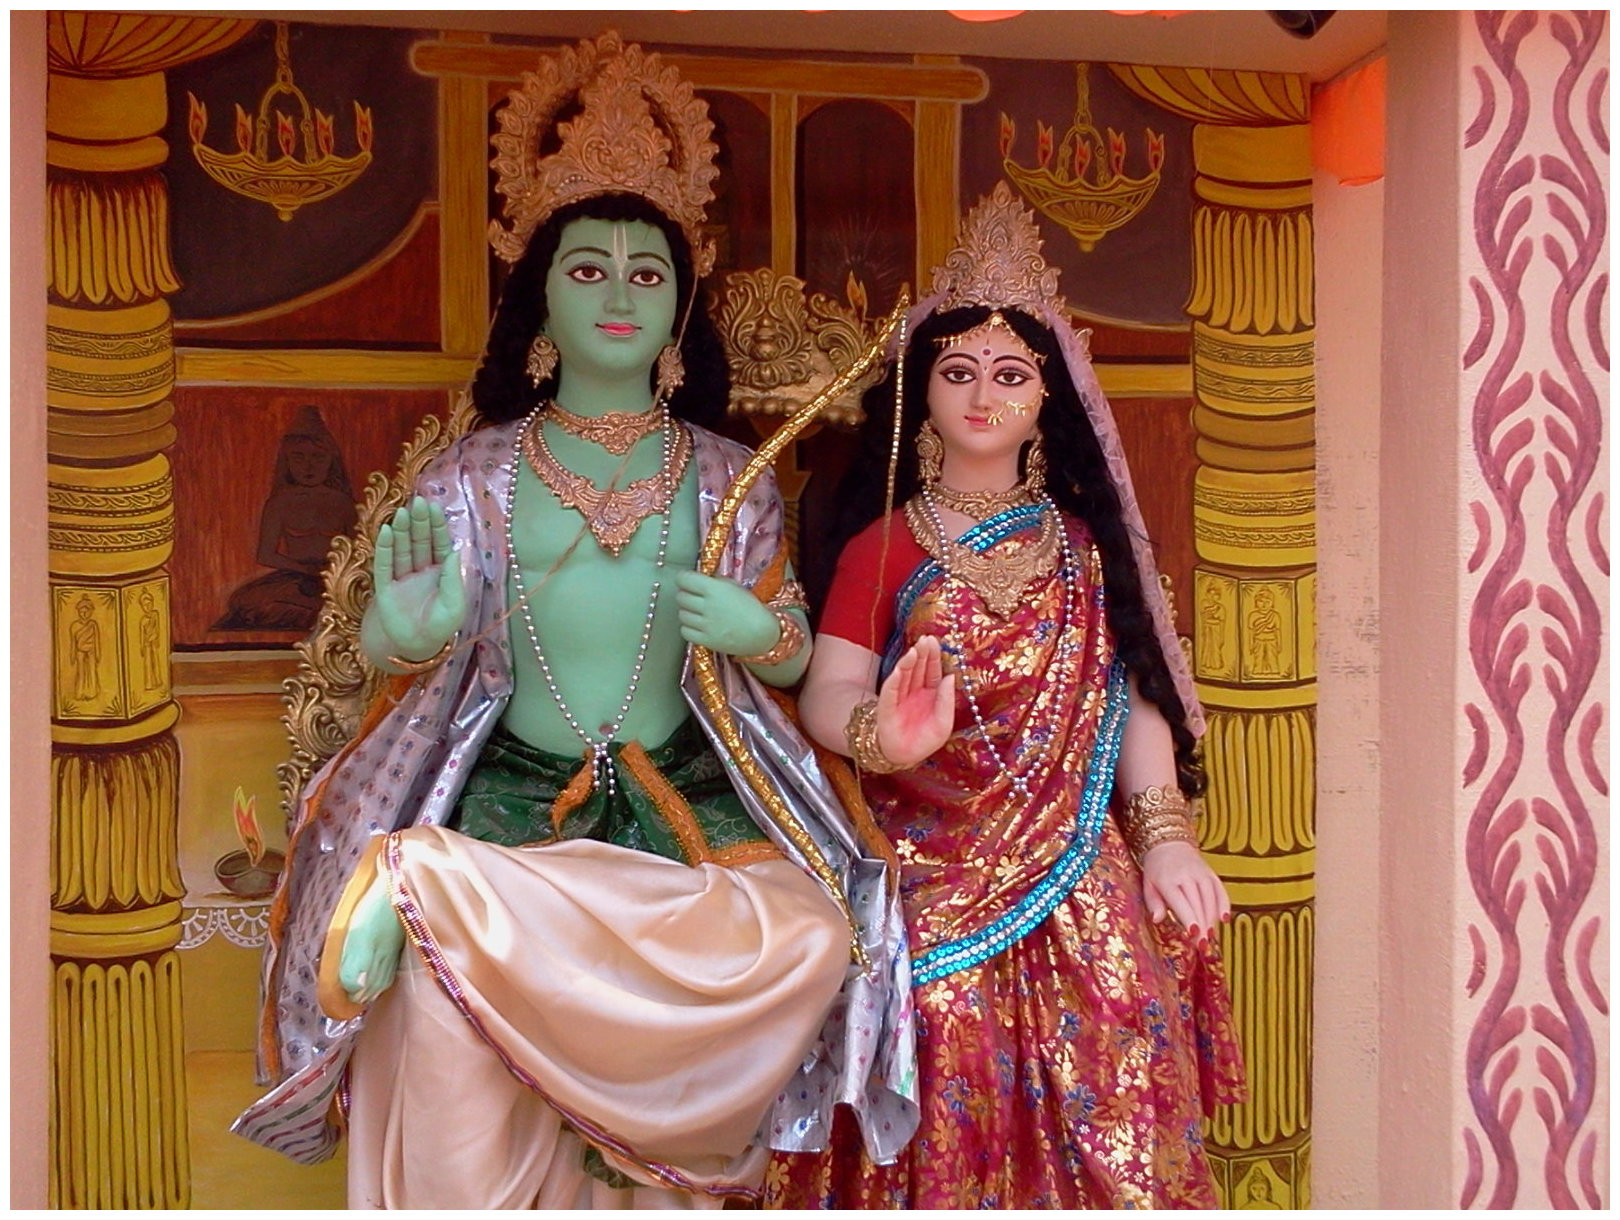 Newly Discovered Hindu Epic Ramayana Portrays Indian Gods